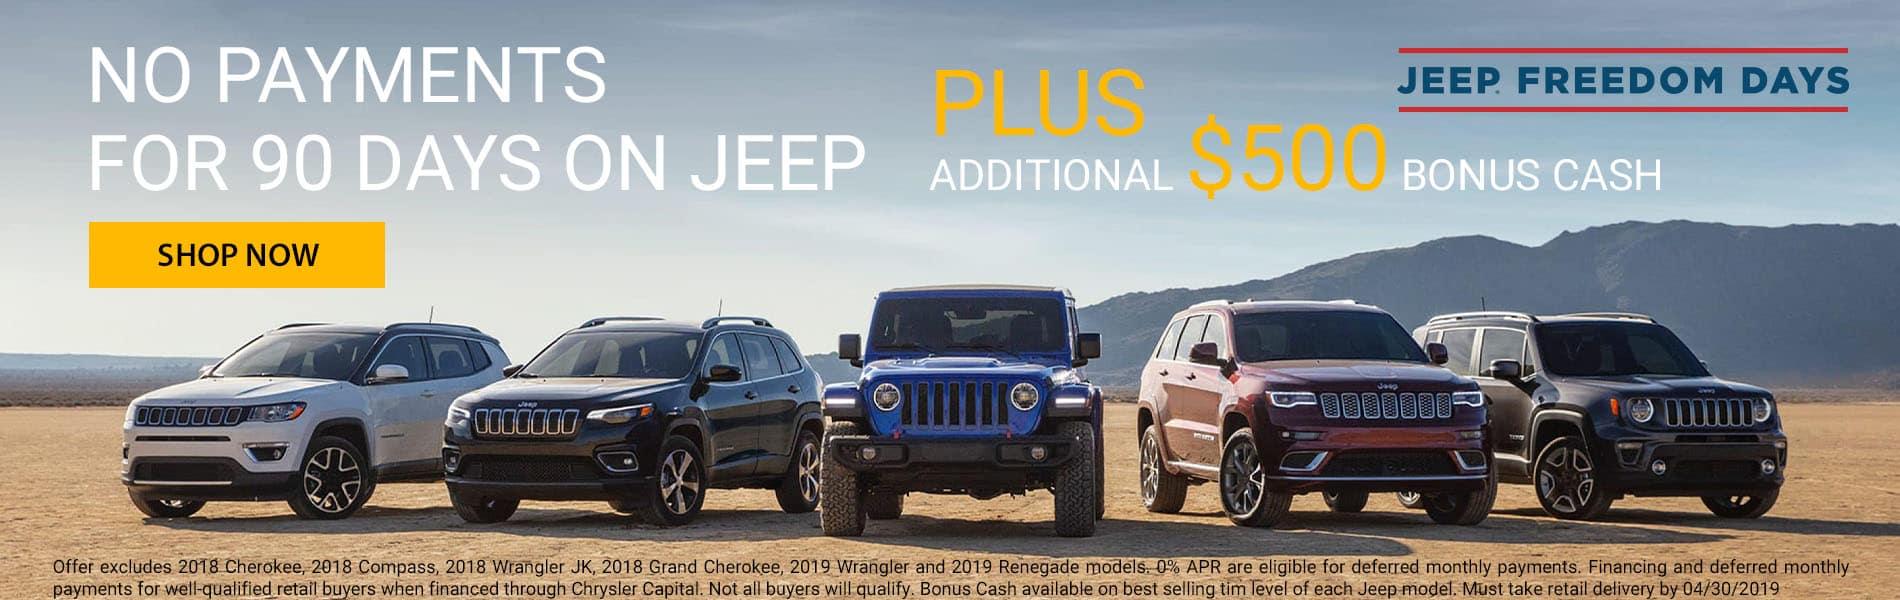 No payments for 90 days plus $500 bonus cash on best selling Jeep trim levels